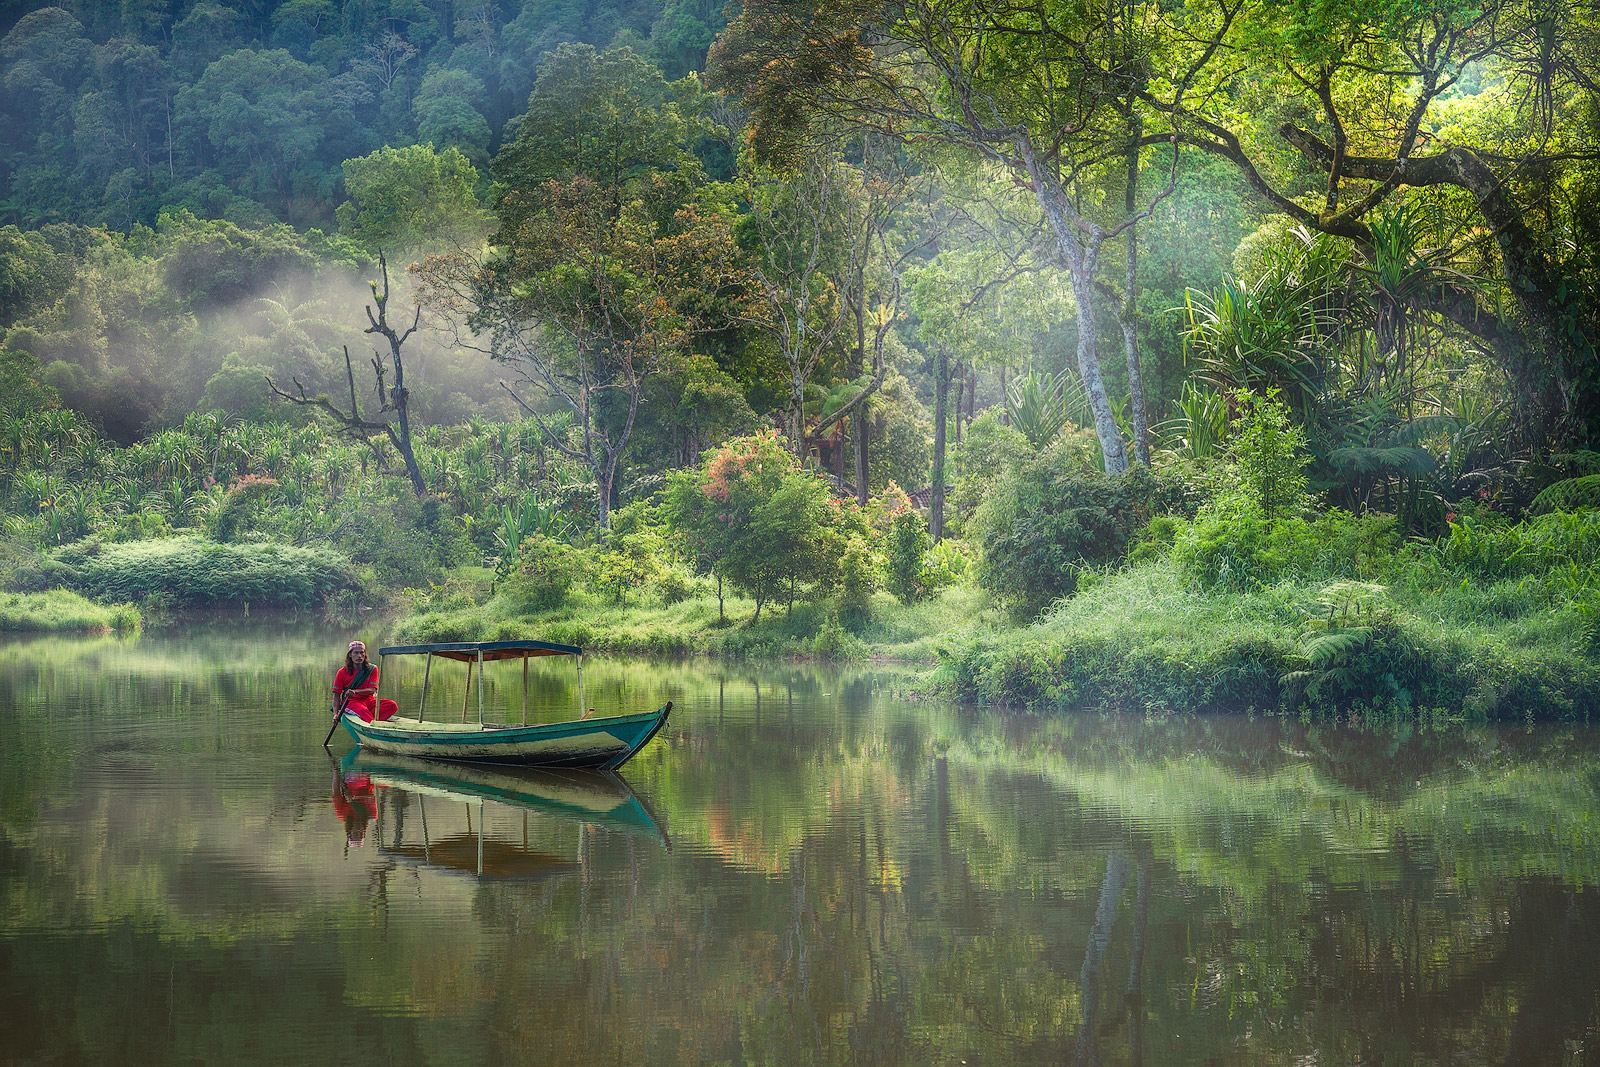 asia, asian, fisherman, gunung gede pangrango national , indonesia, indonesian, java, lake, situ gunung, sukabumi, water body, west java, photo